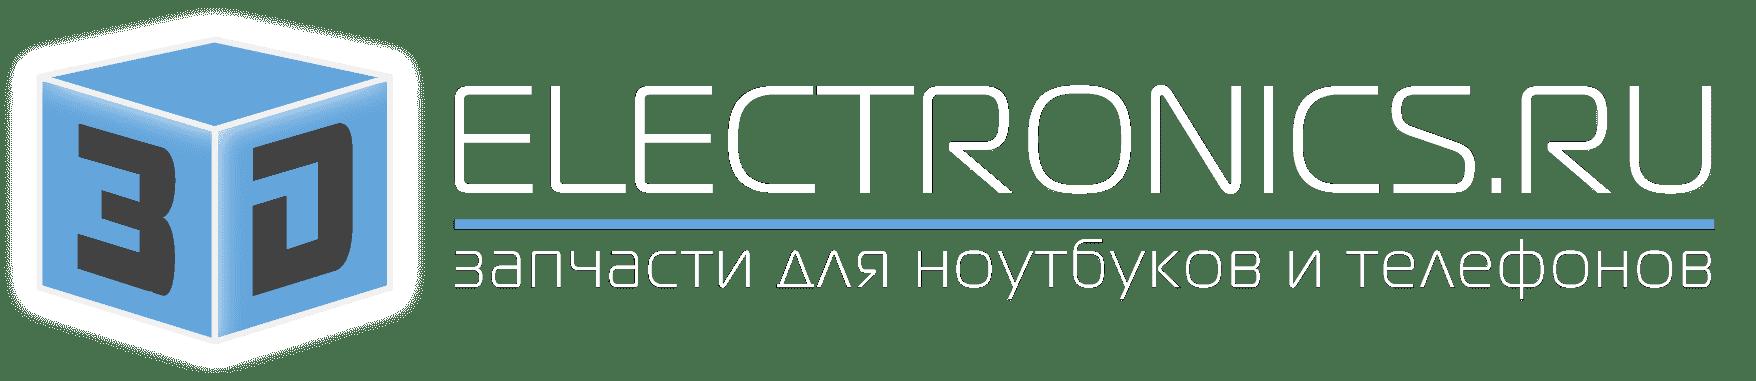 3Delectronics - запчасти